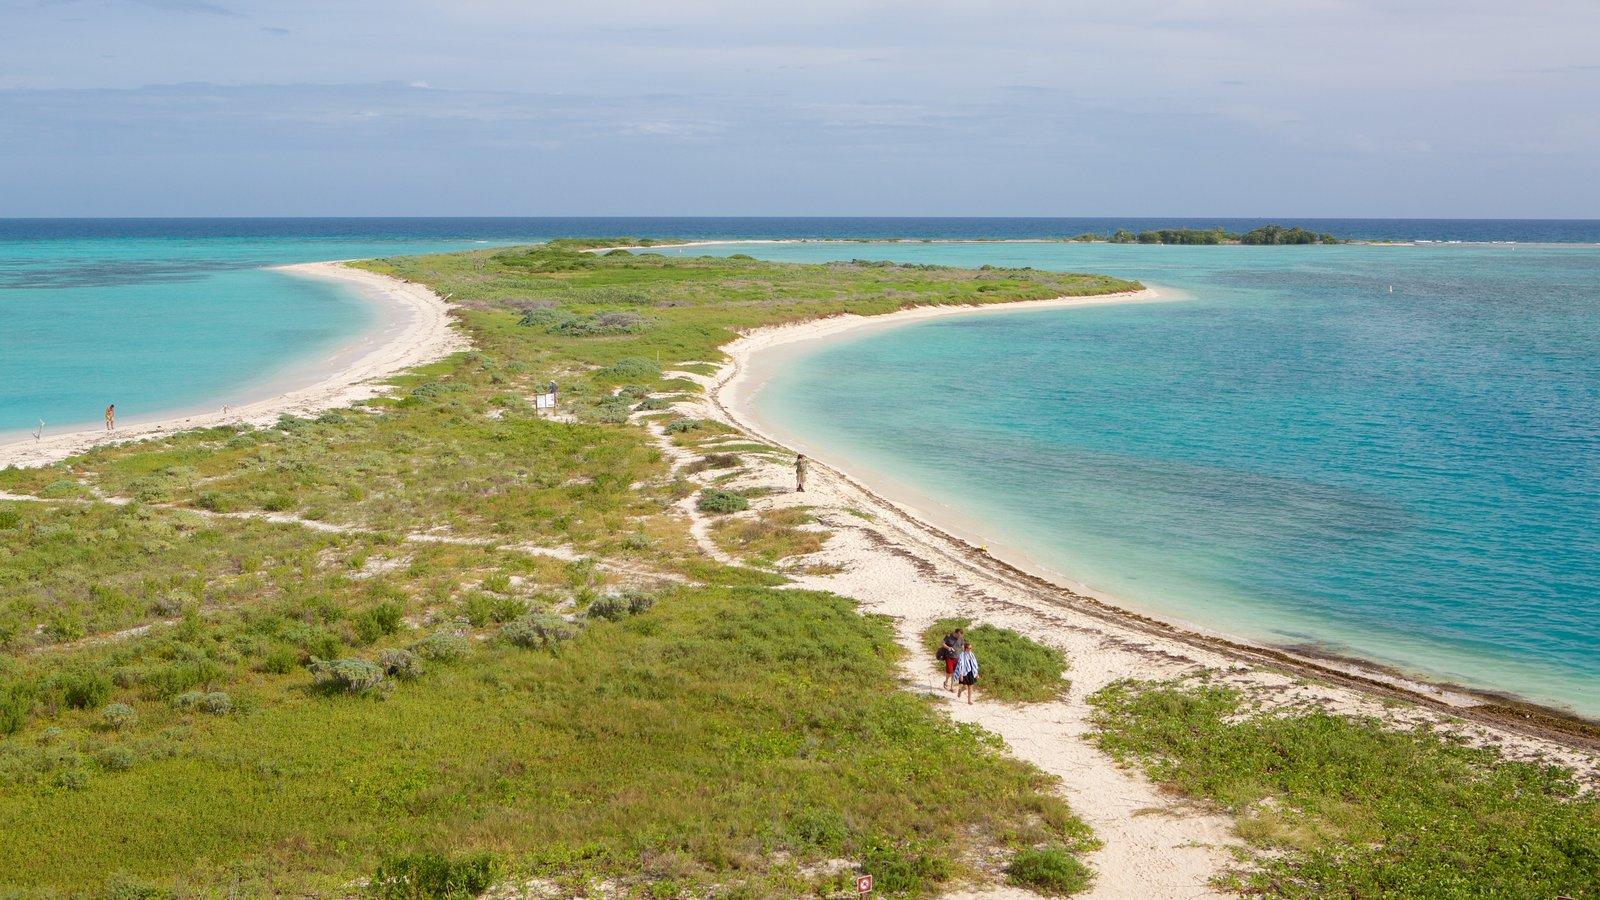 Flórida Keys caracterizando paisagens litorâneas